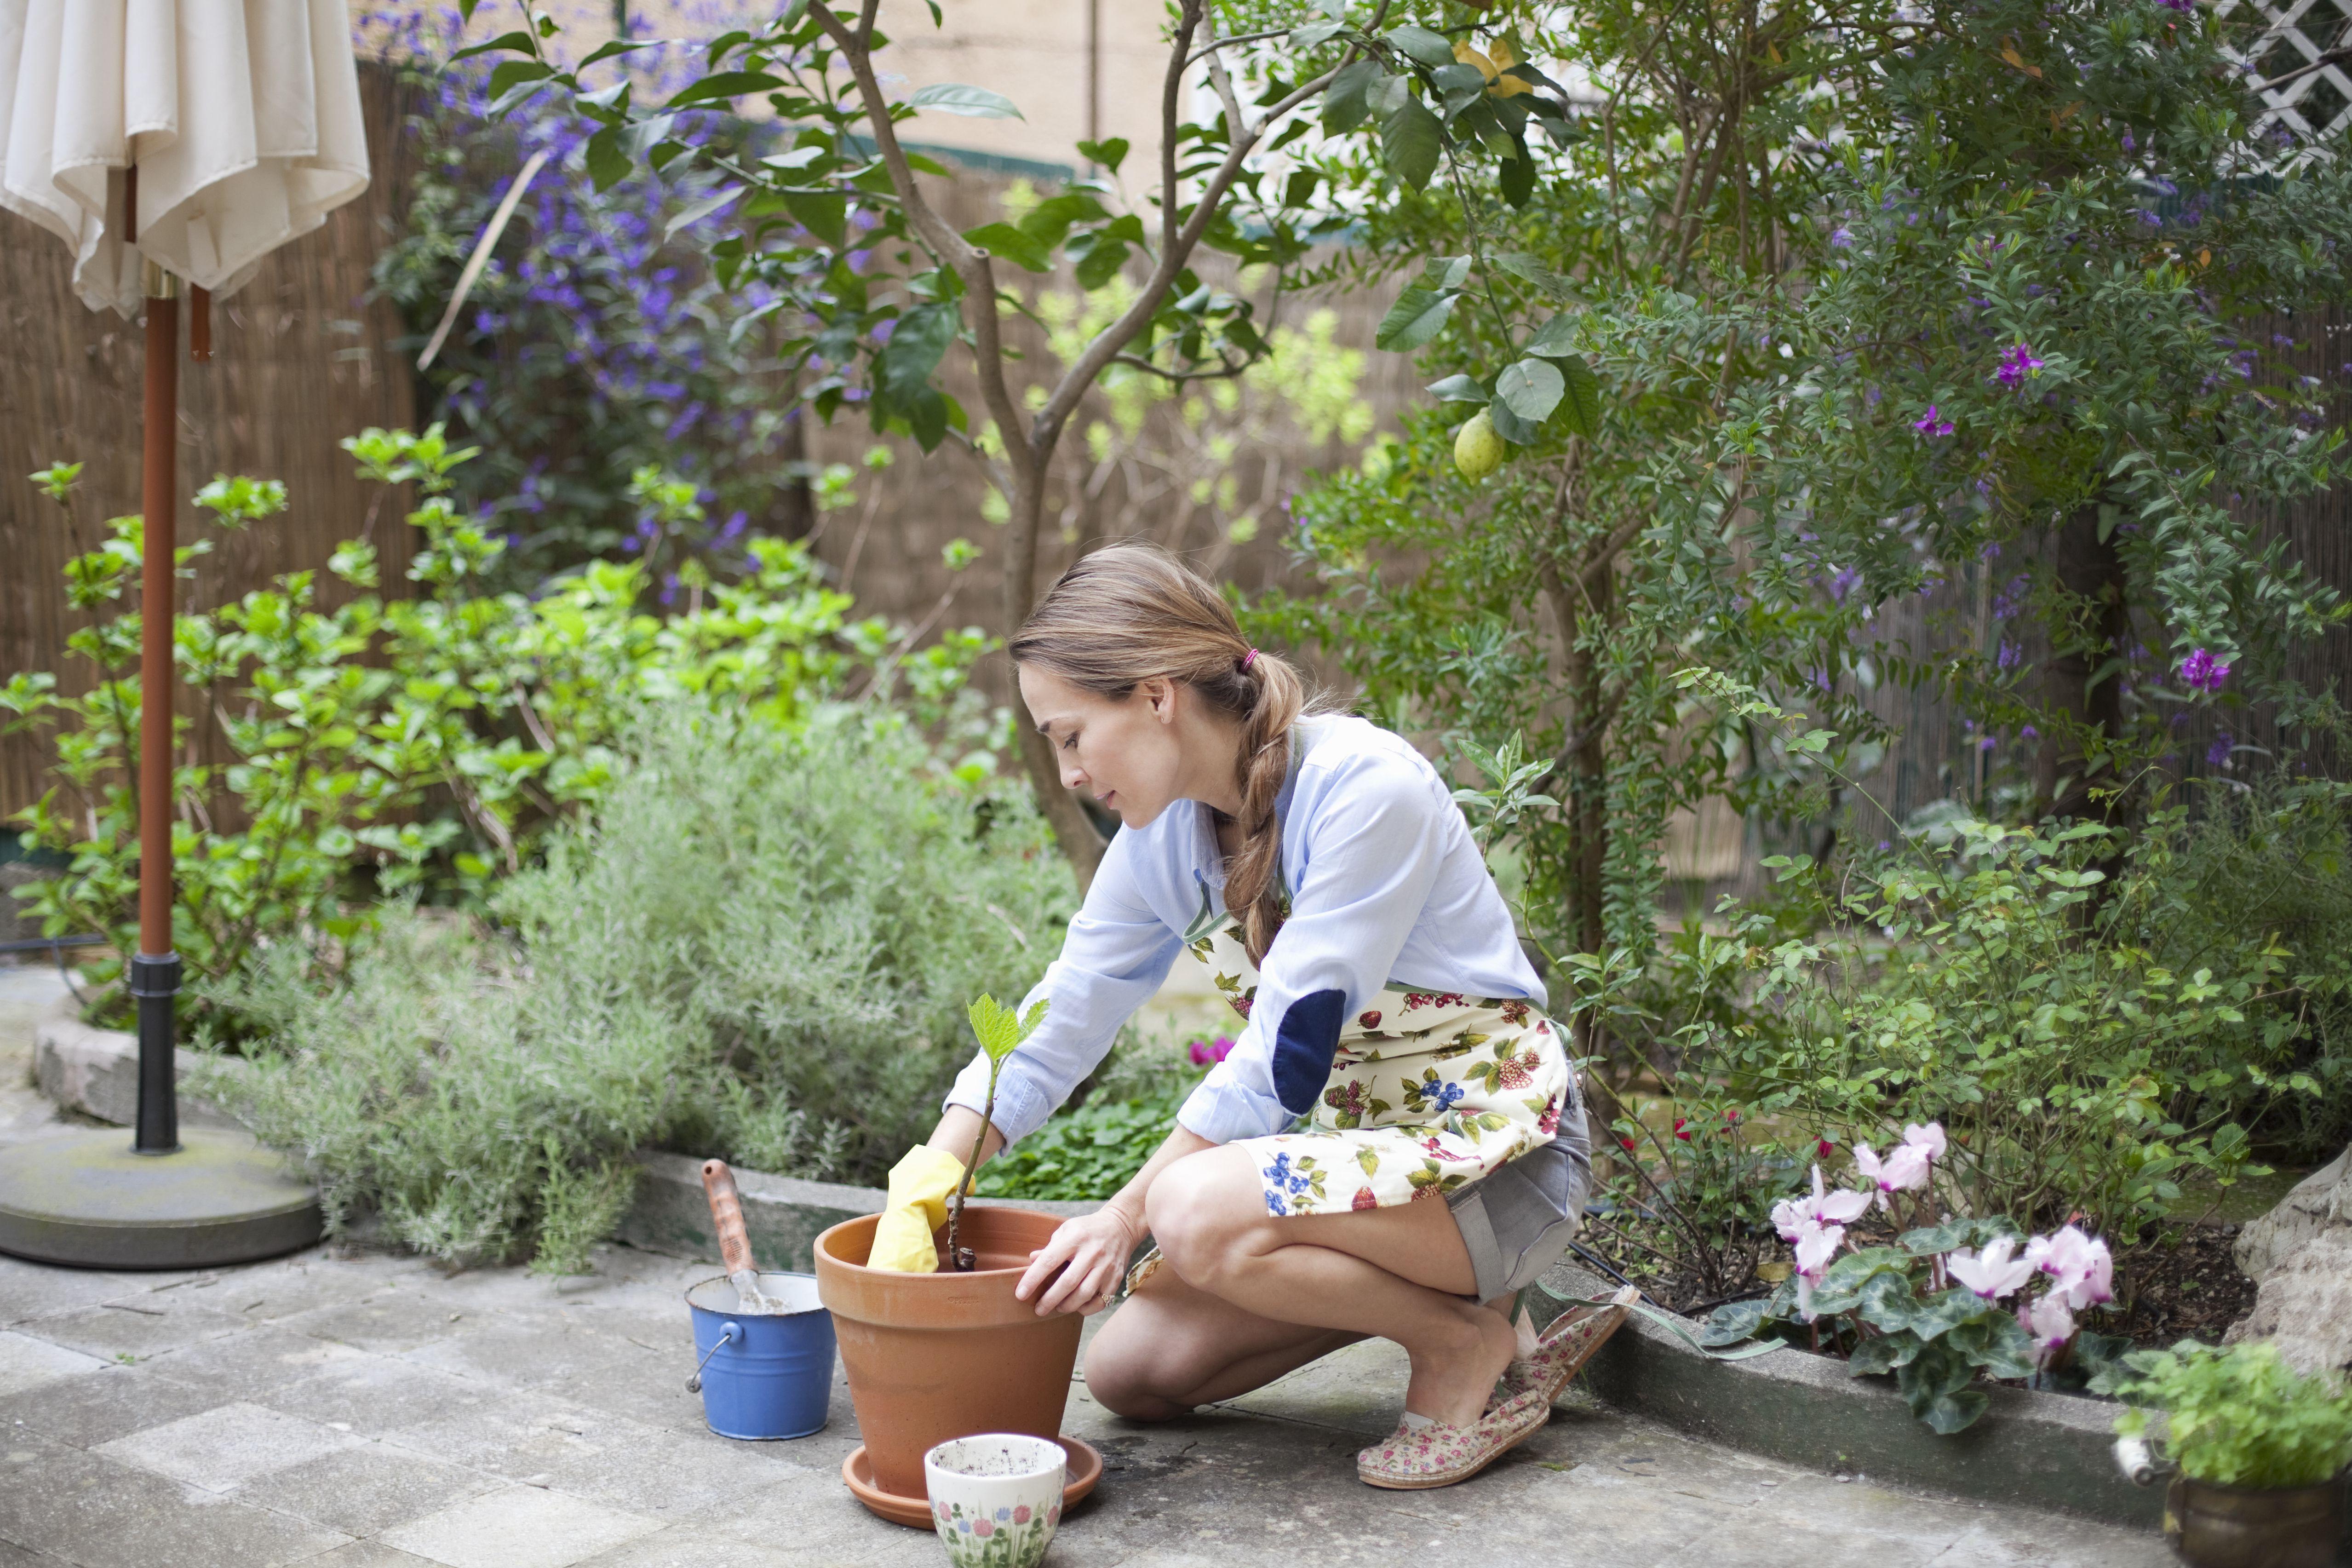 The 9 Best Gardening Tools To Buy In 2018